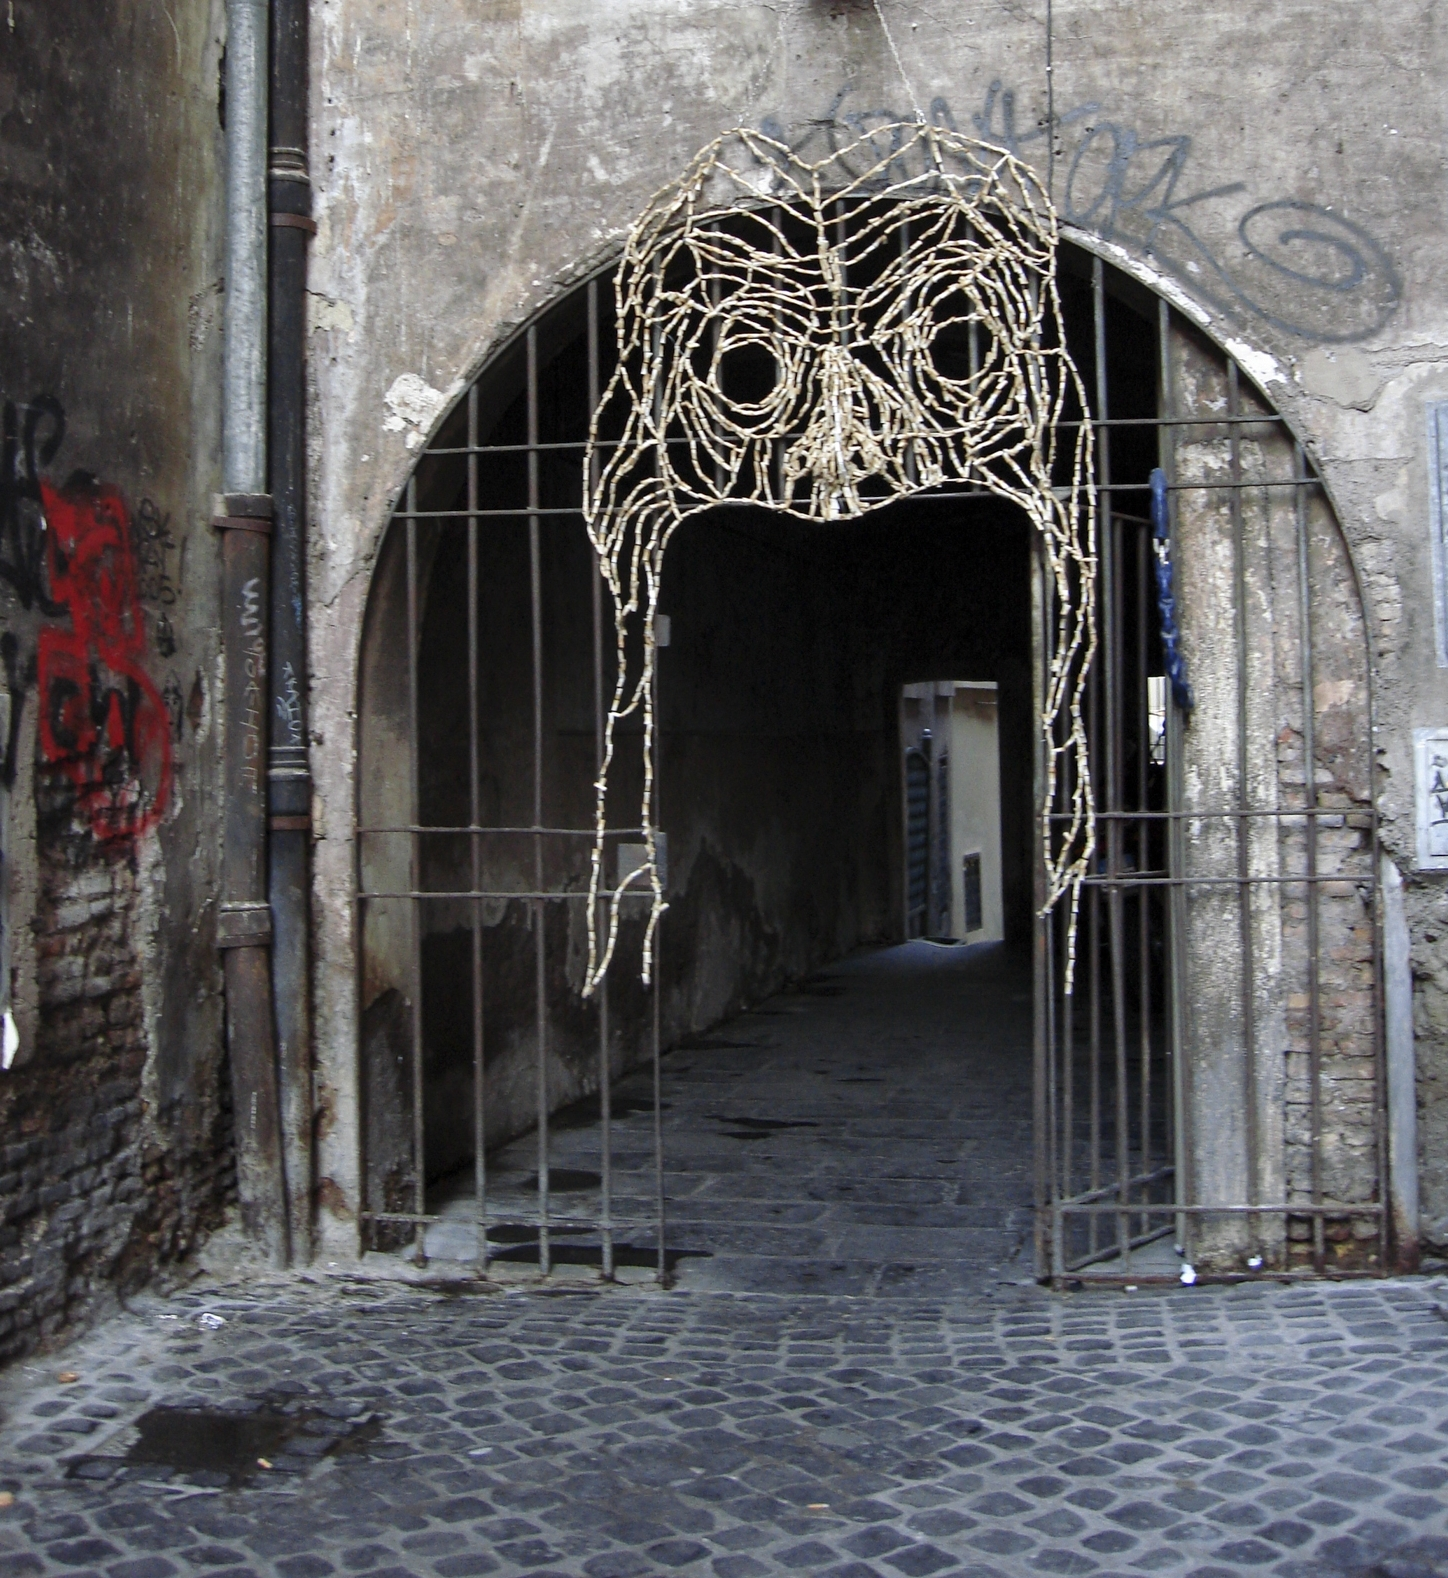 Mask (install) (sculpture/installation, Rome, Italy)